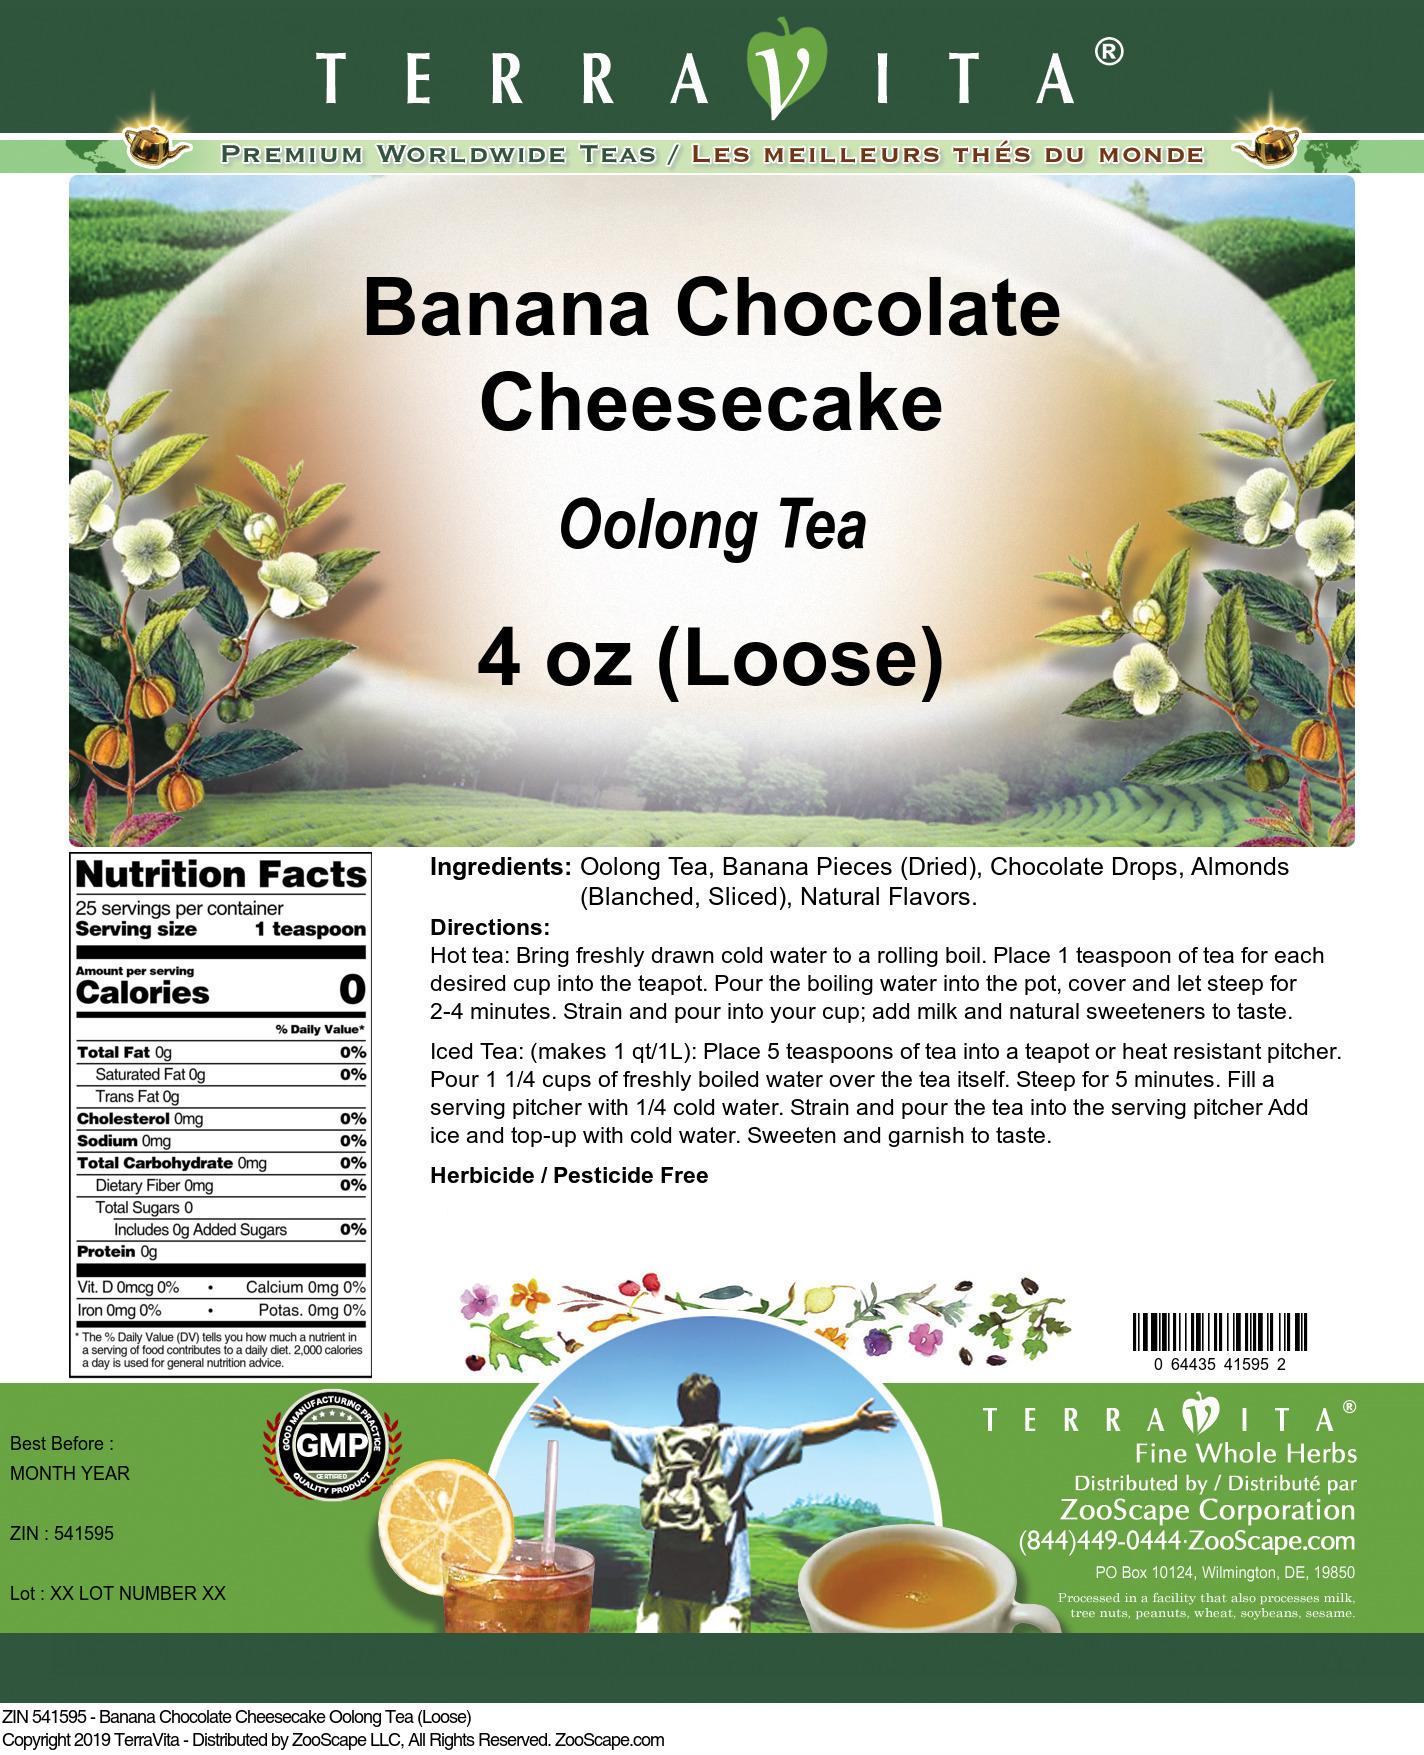 Banana Chocolate Cheesecake Oolong Tea